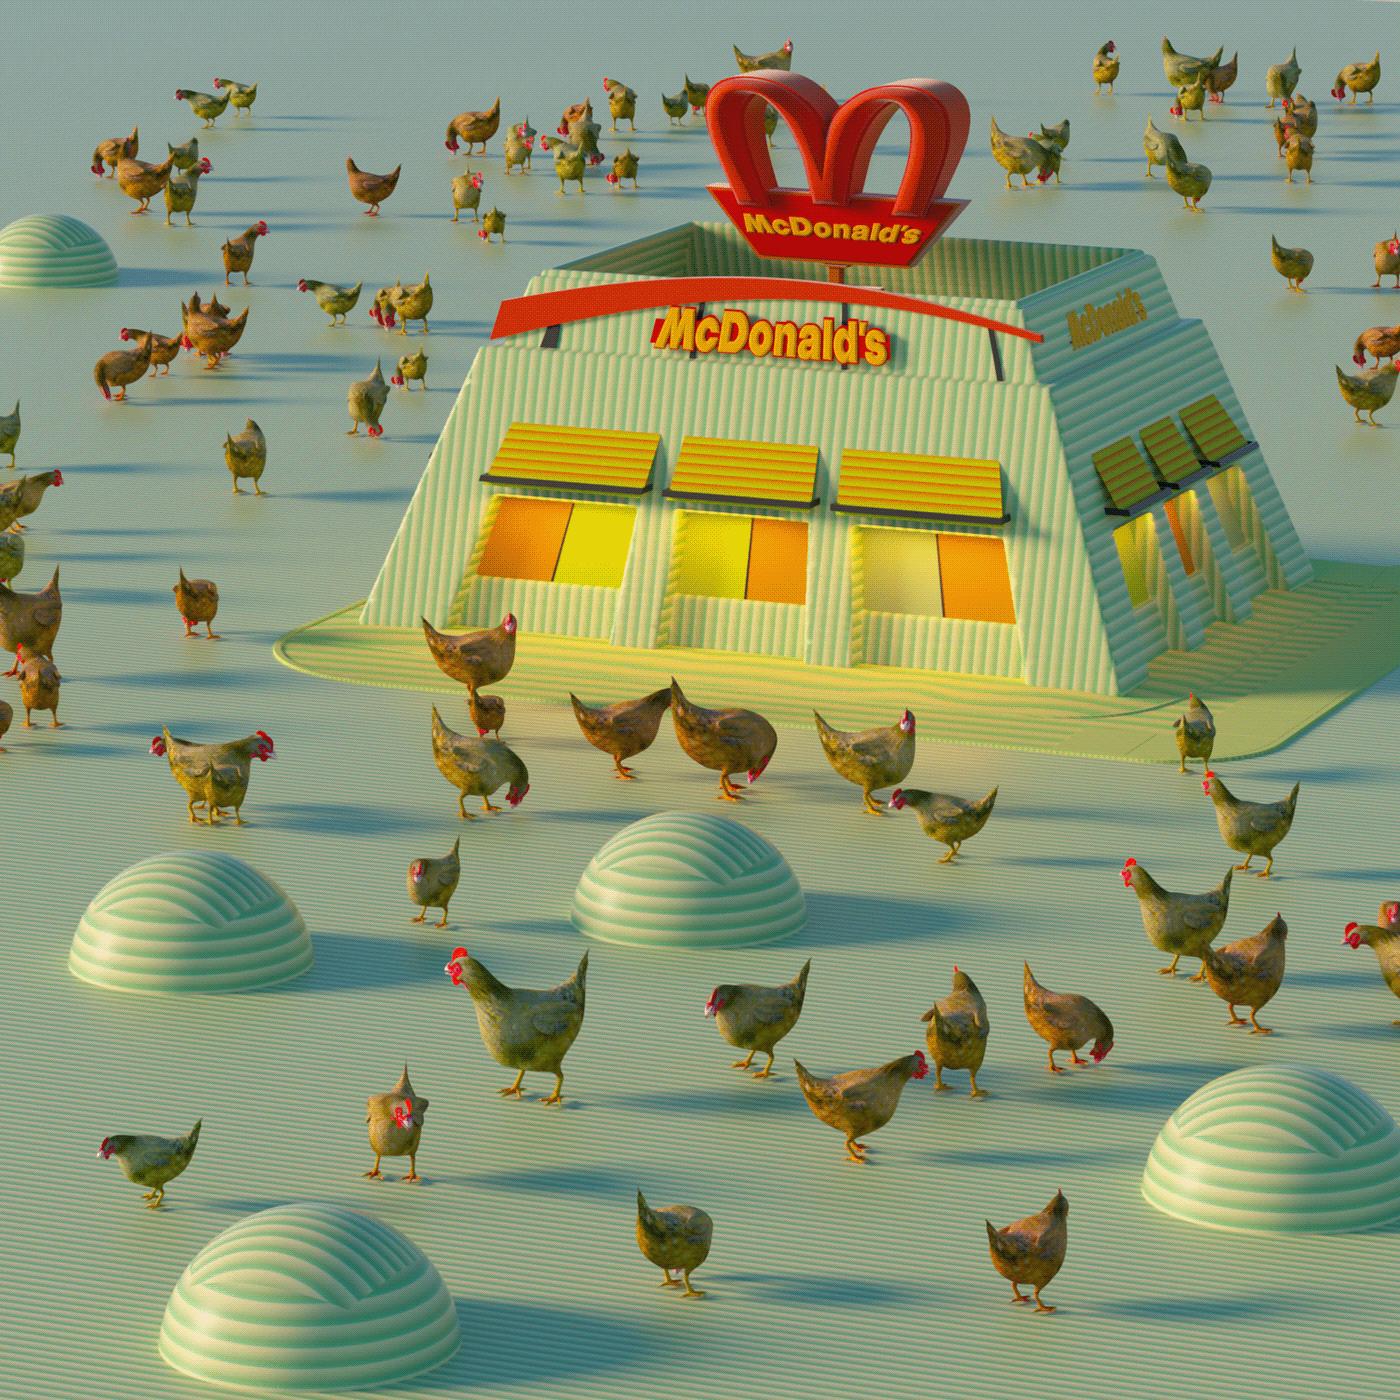 3d artist animation  animator c4d chiken cinema 4d COVID-19 freedom lockdown mcdonald